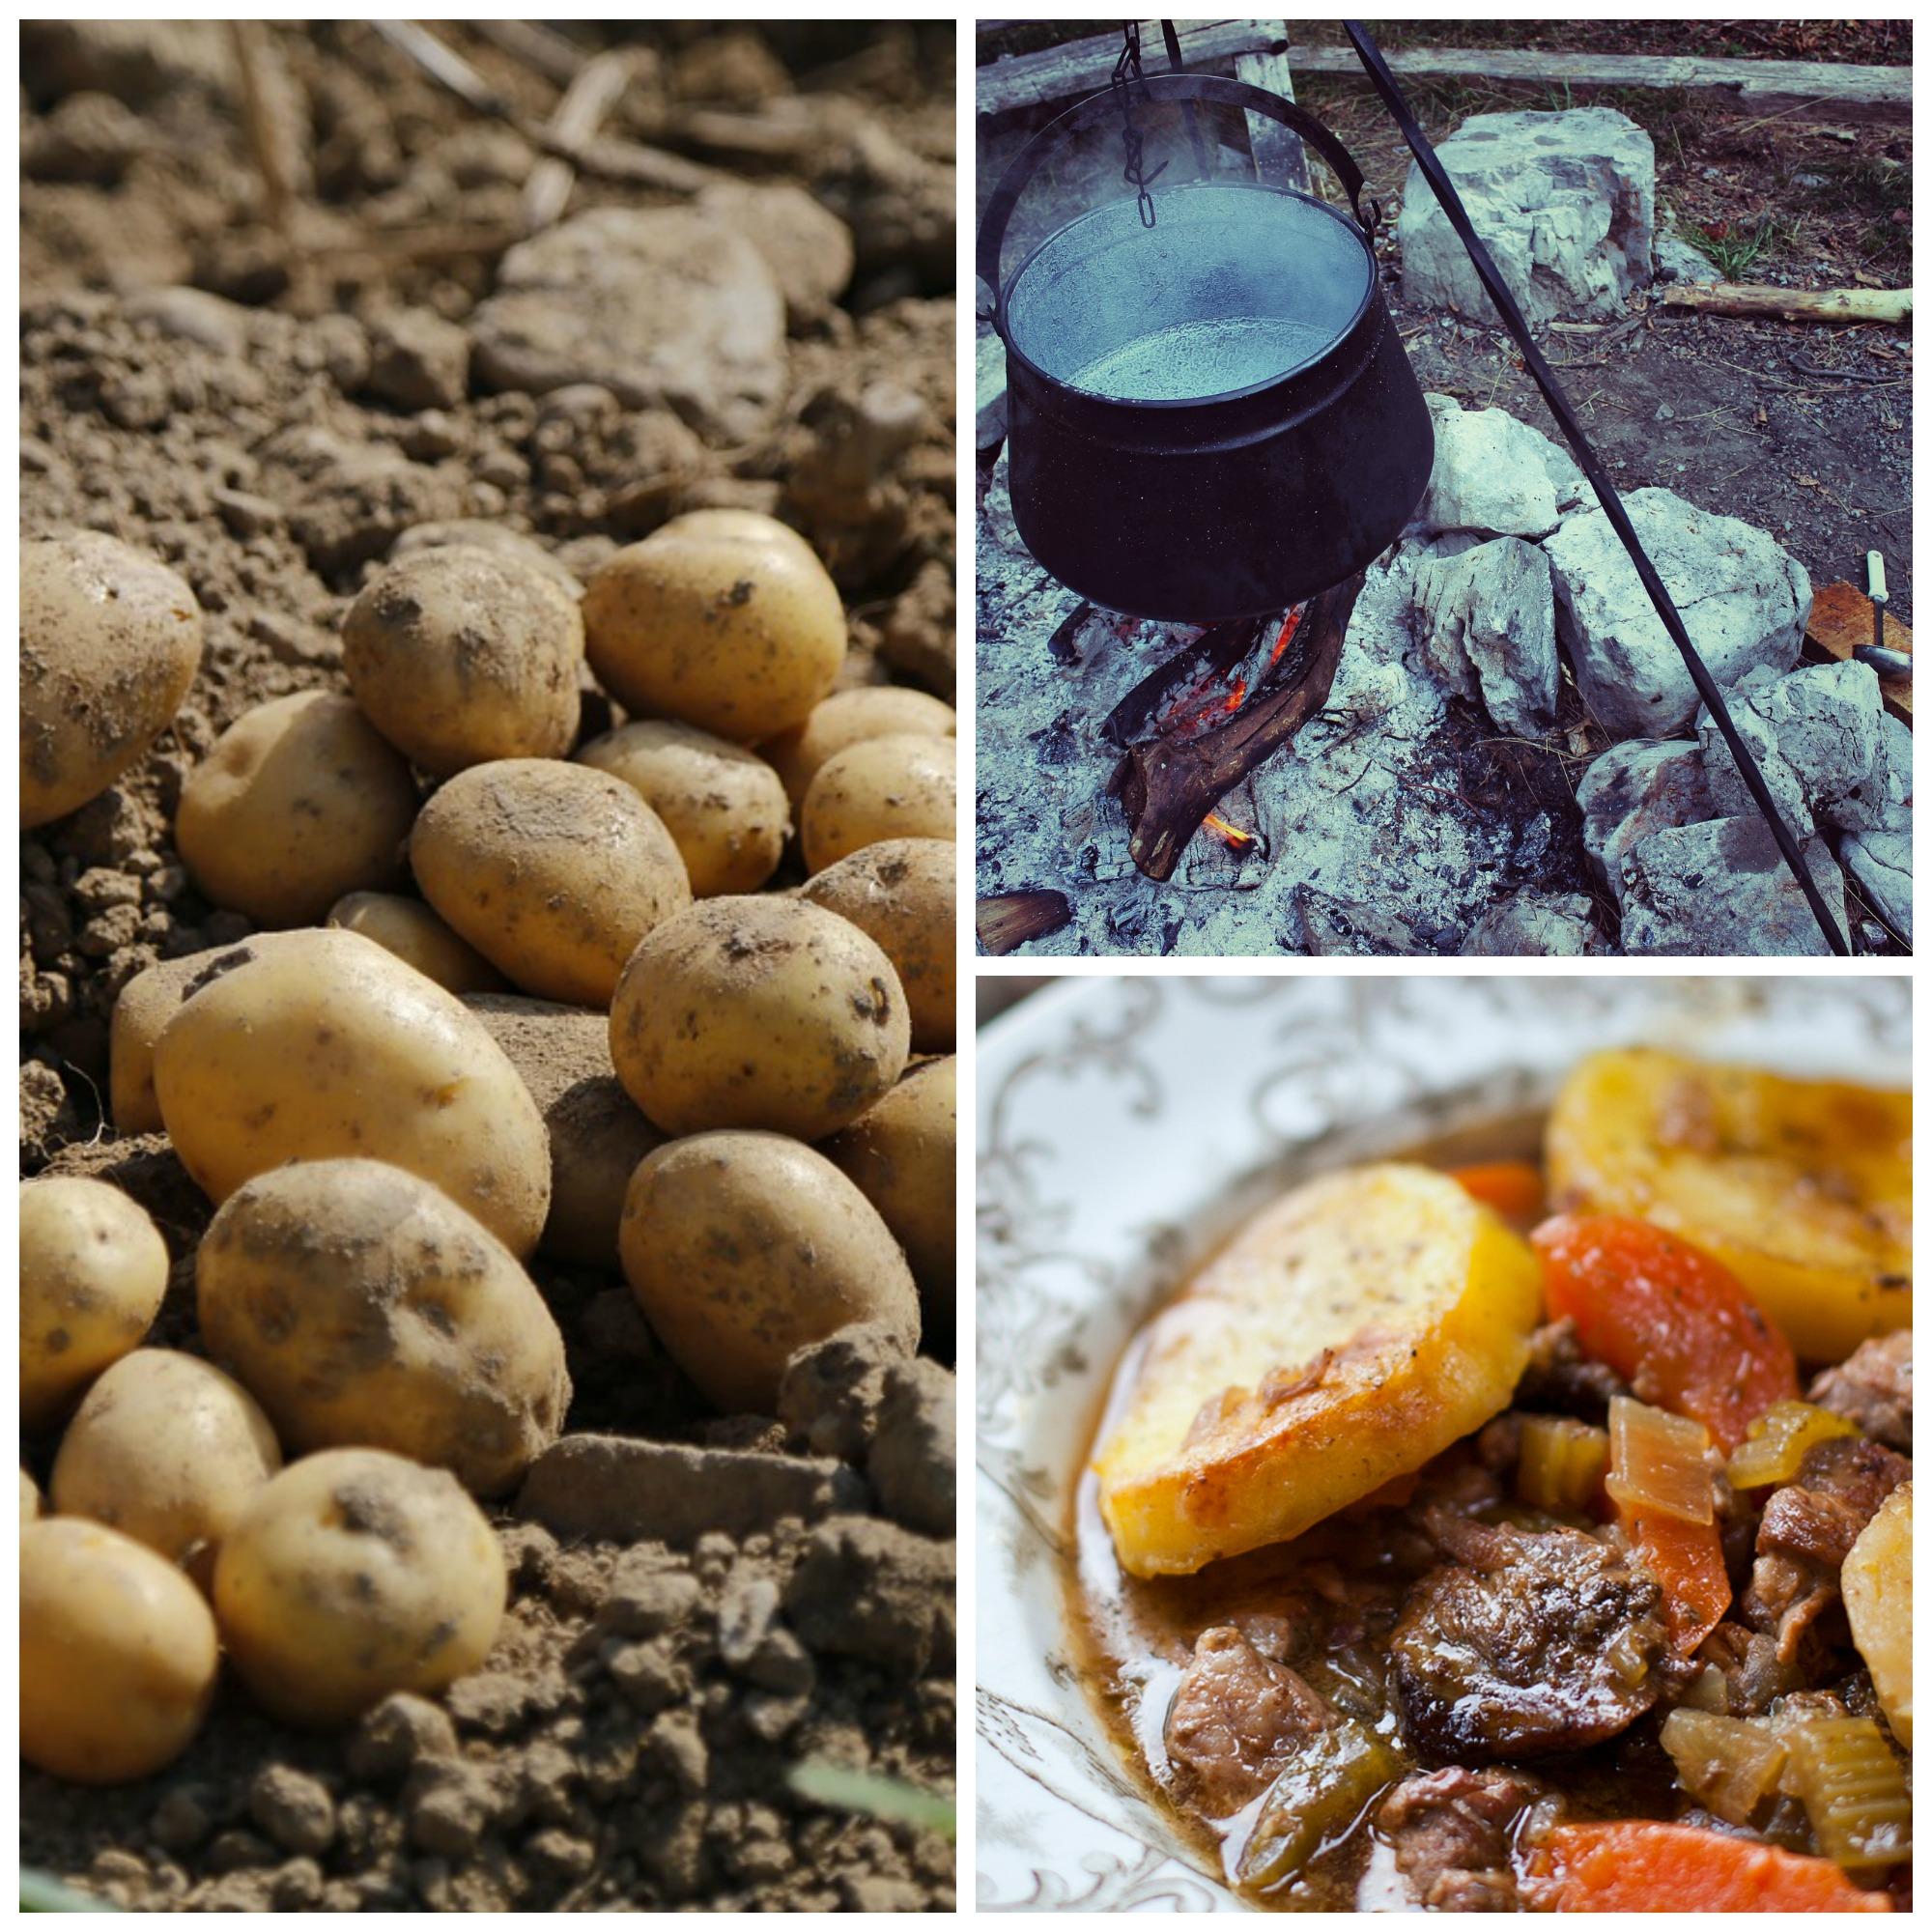 Harvested potatoes | © Jai79/Pixabay / Hanging pot | © Waldo93/Pixabay / Irish stew | Courtesy of DonalSkehan.com